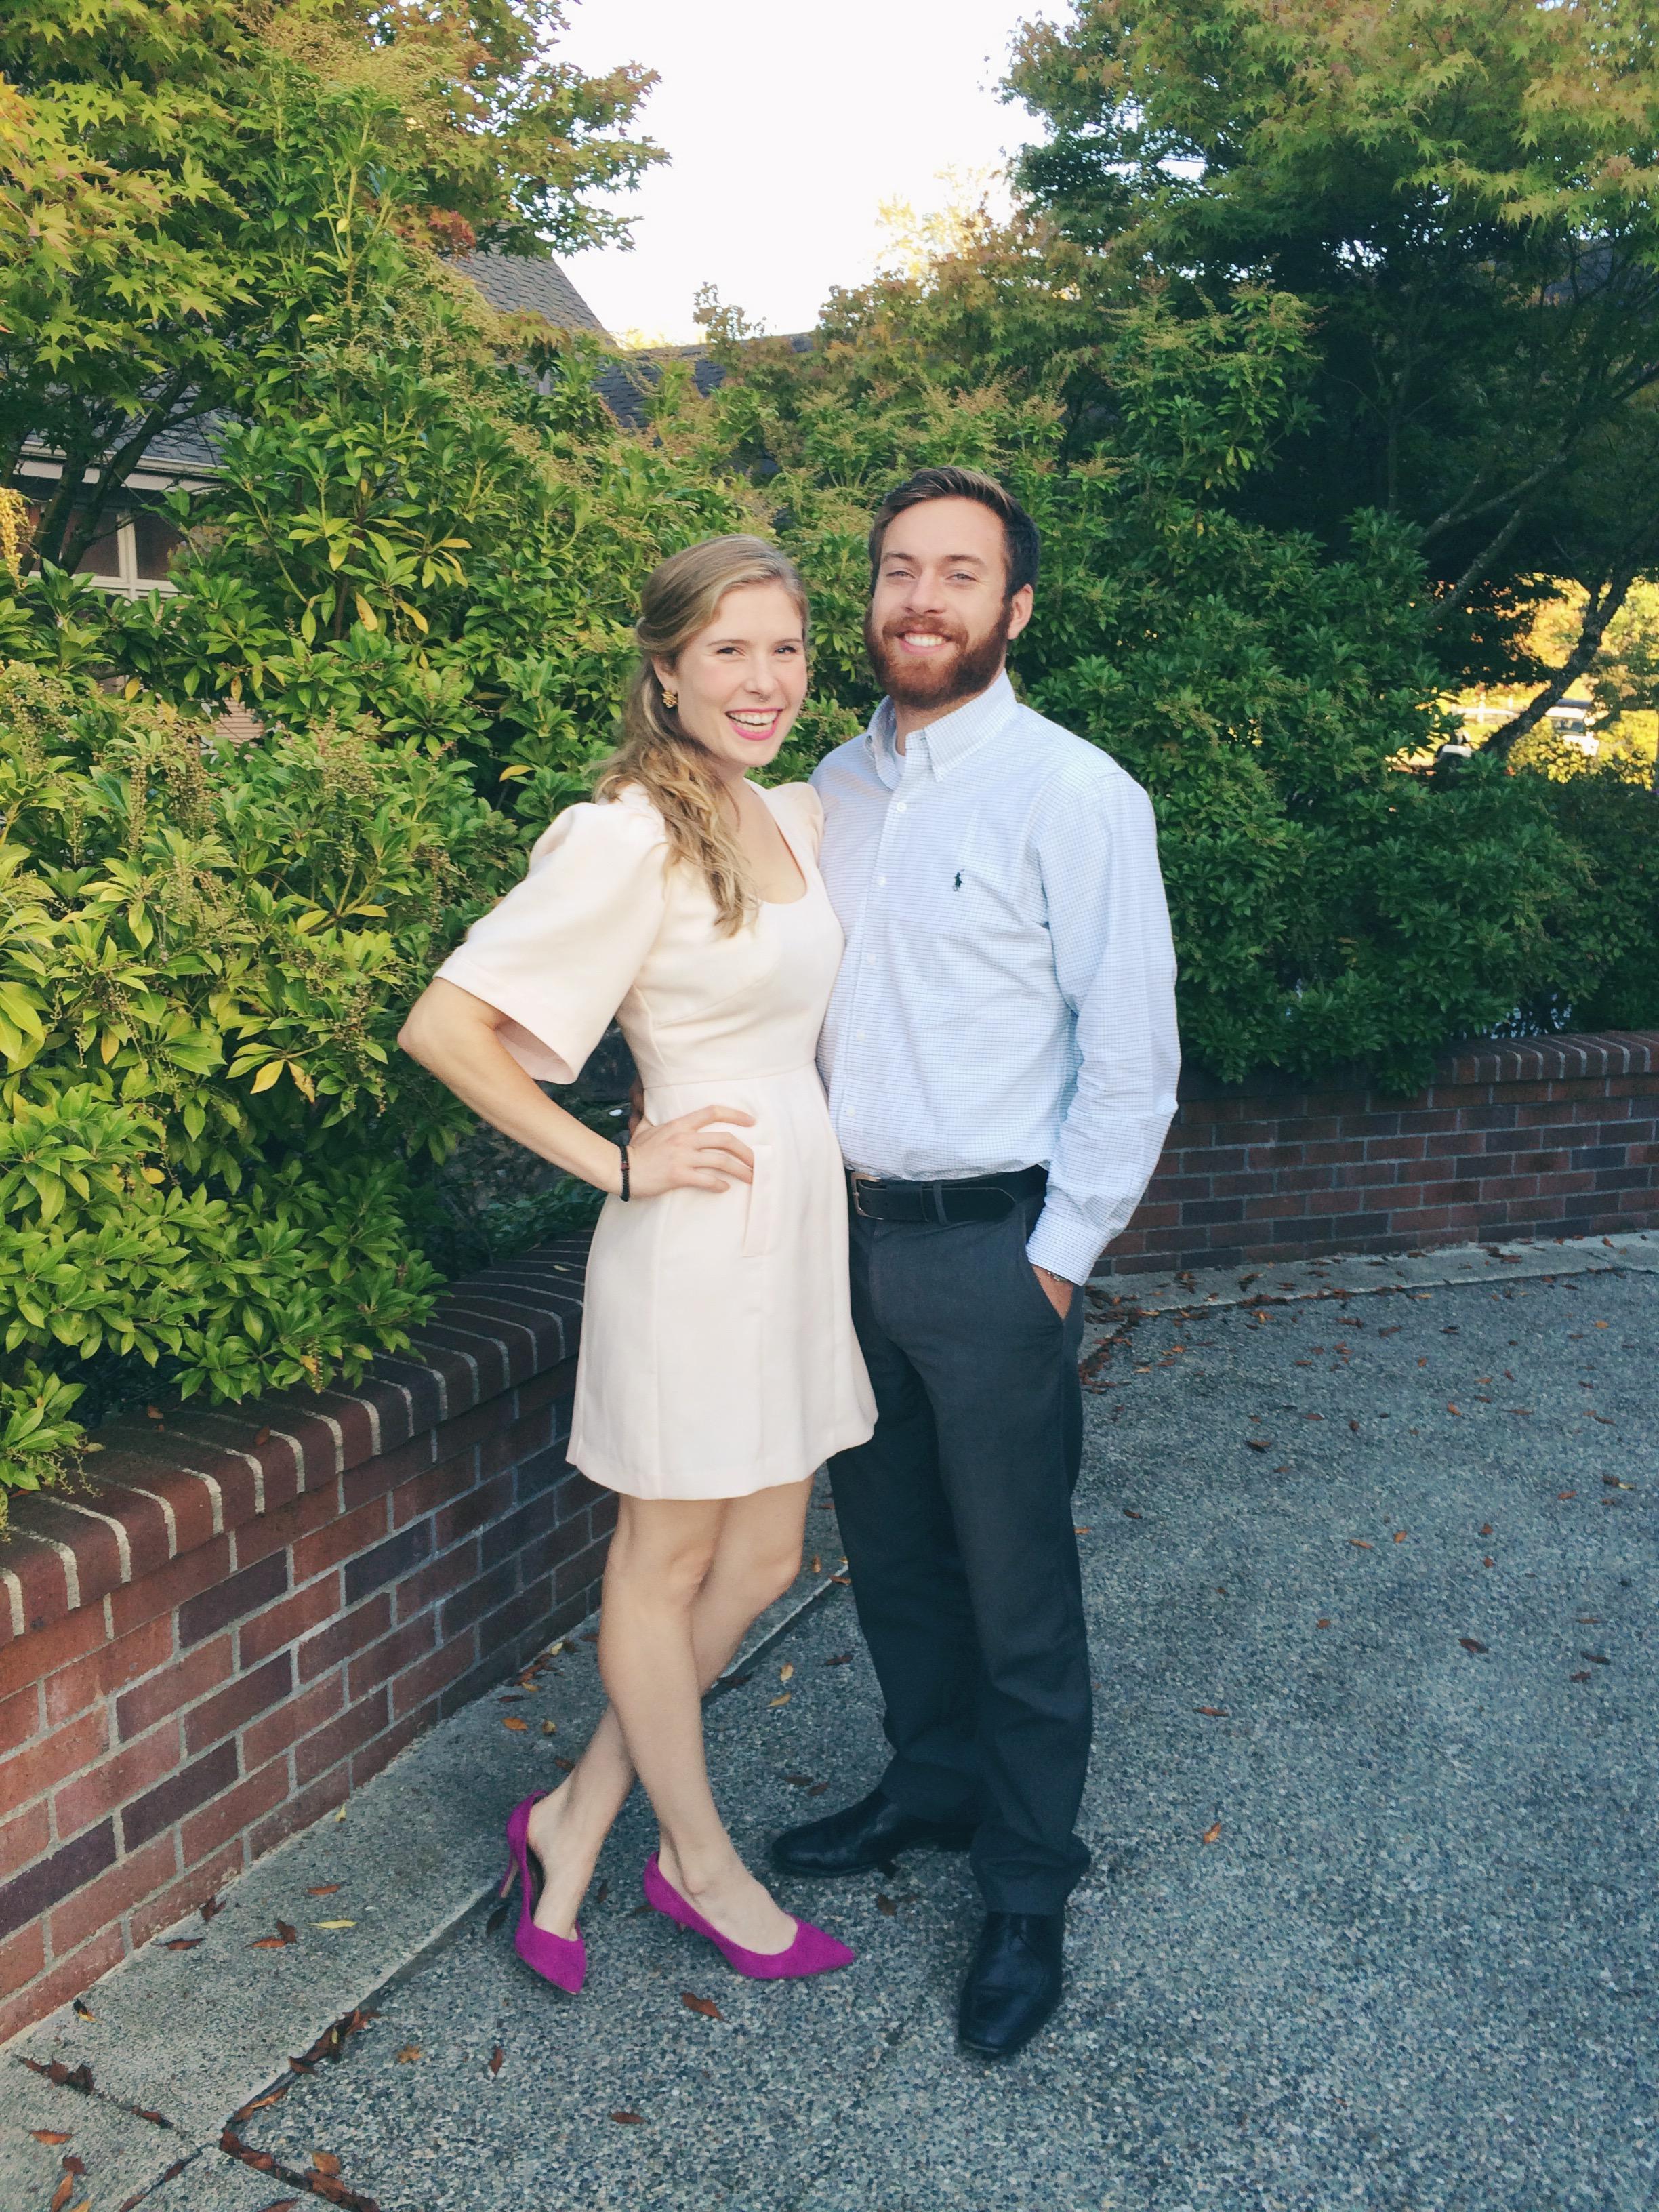 Me and Marsh at our last wedding of wedding season 2014